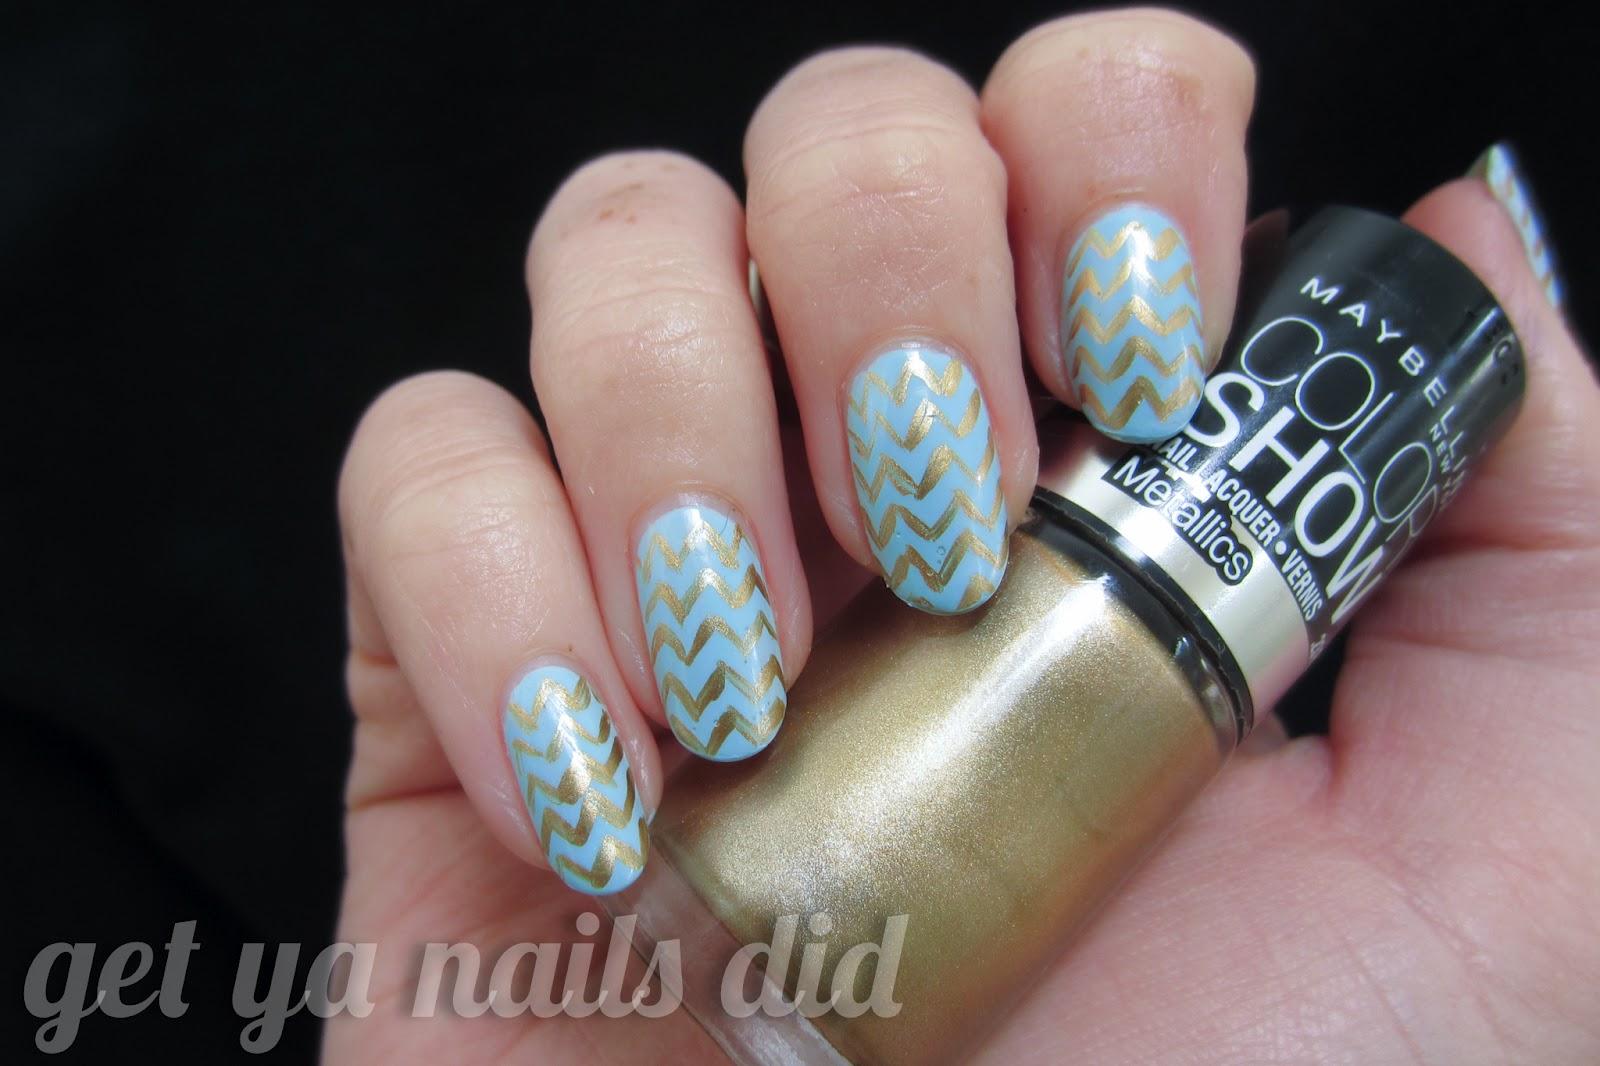 get ya nails did: weddin\' bells